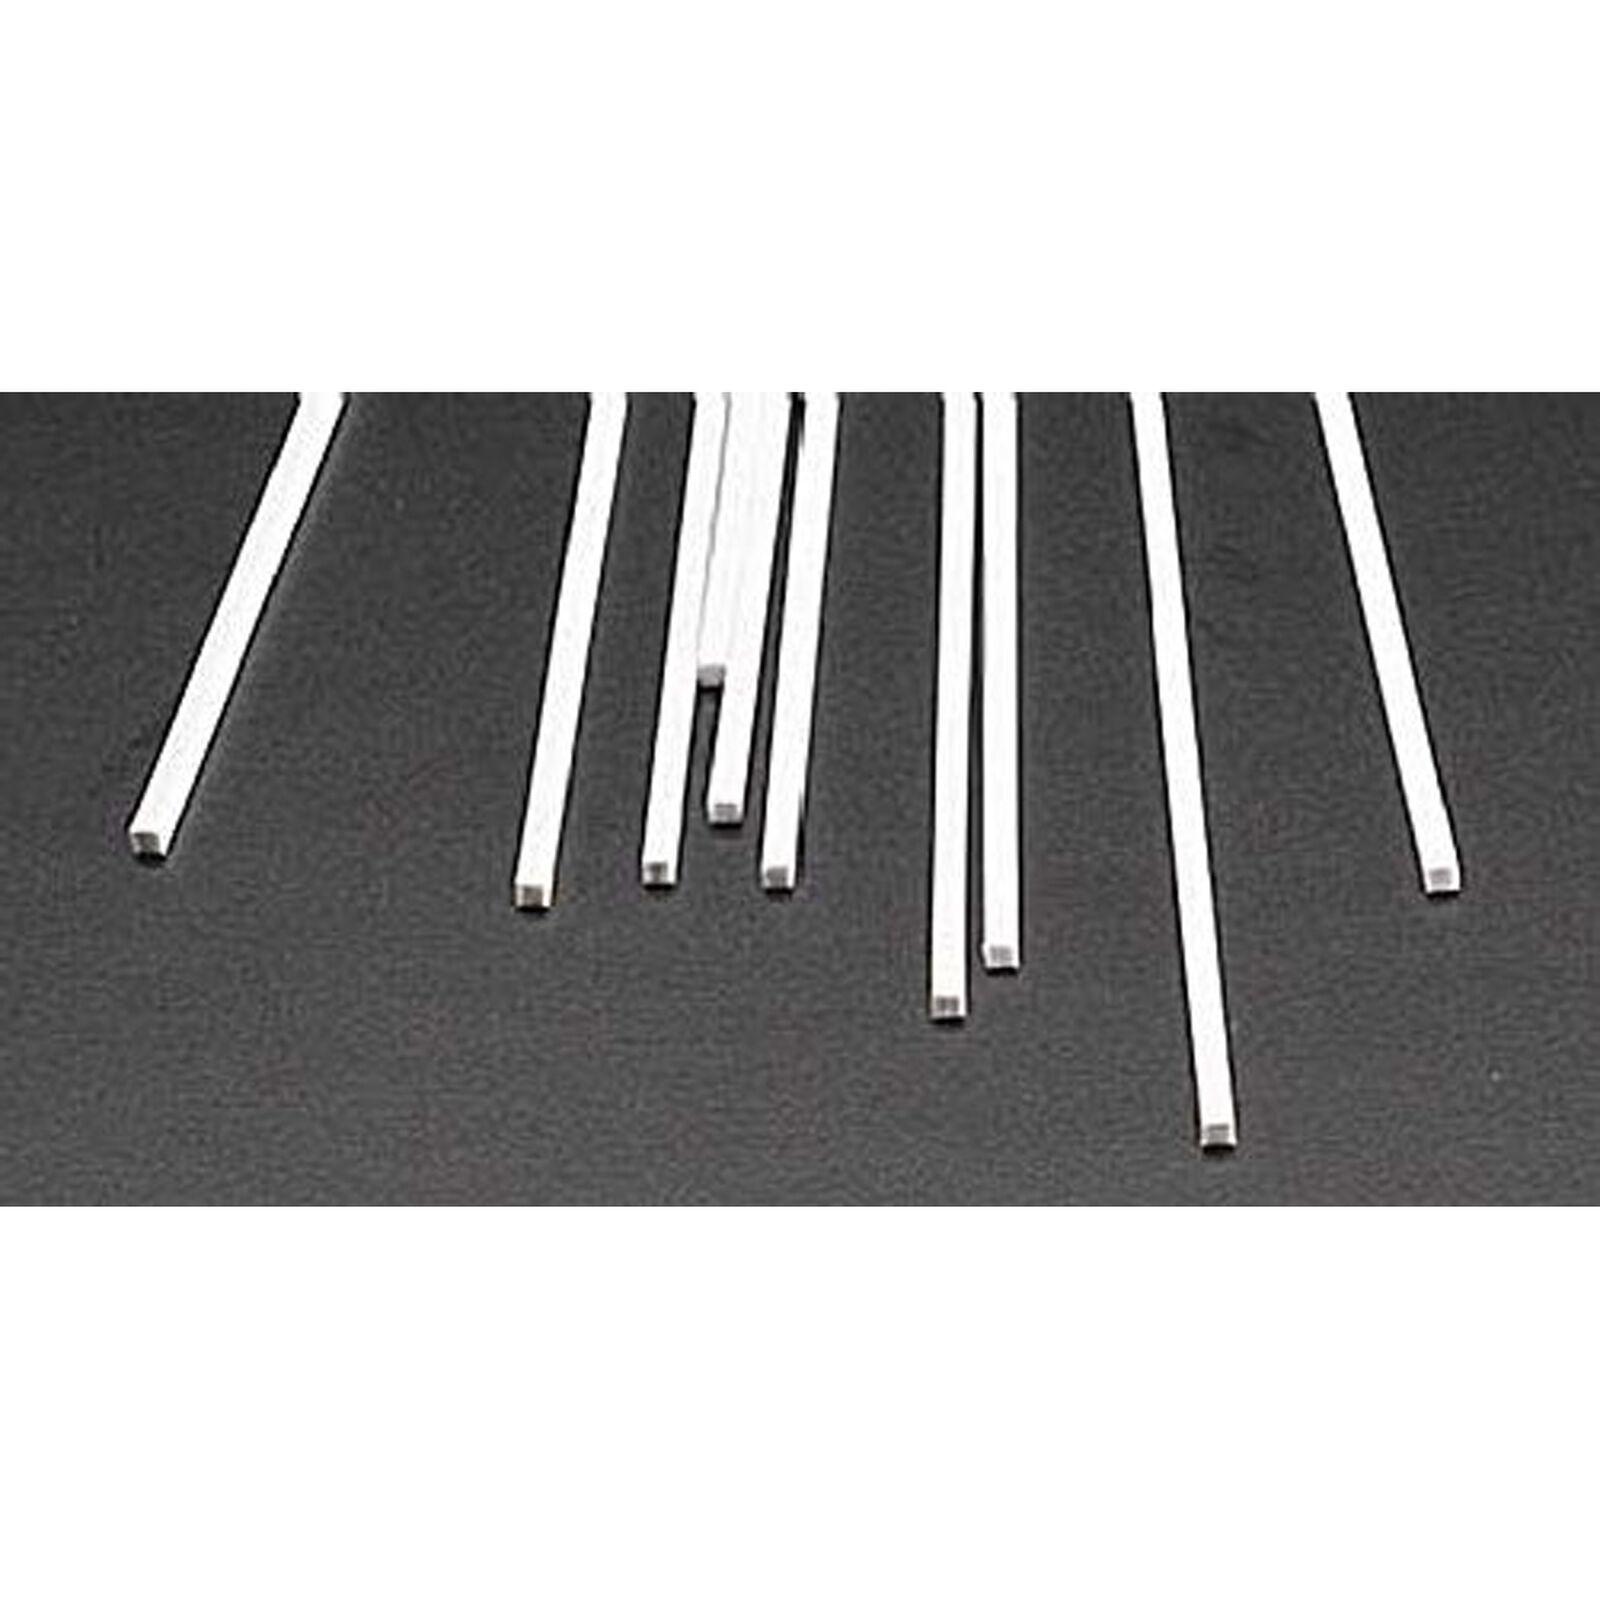 MS-80 Square Rod,.080 (10)